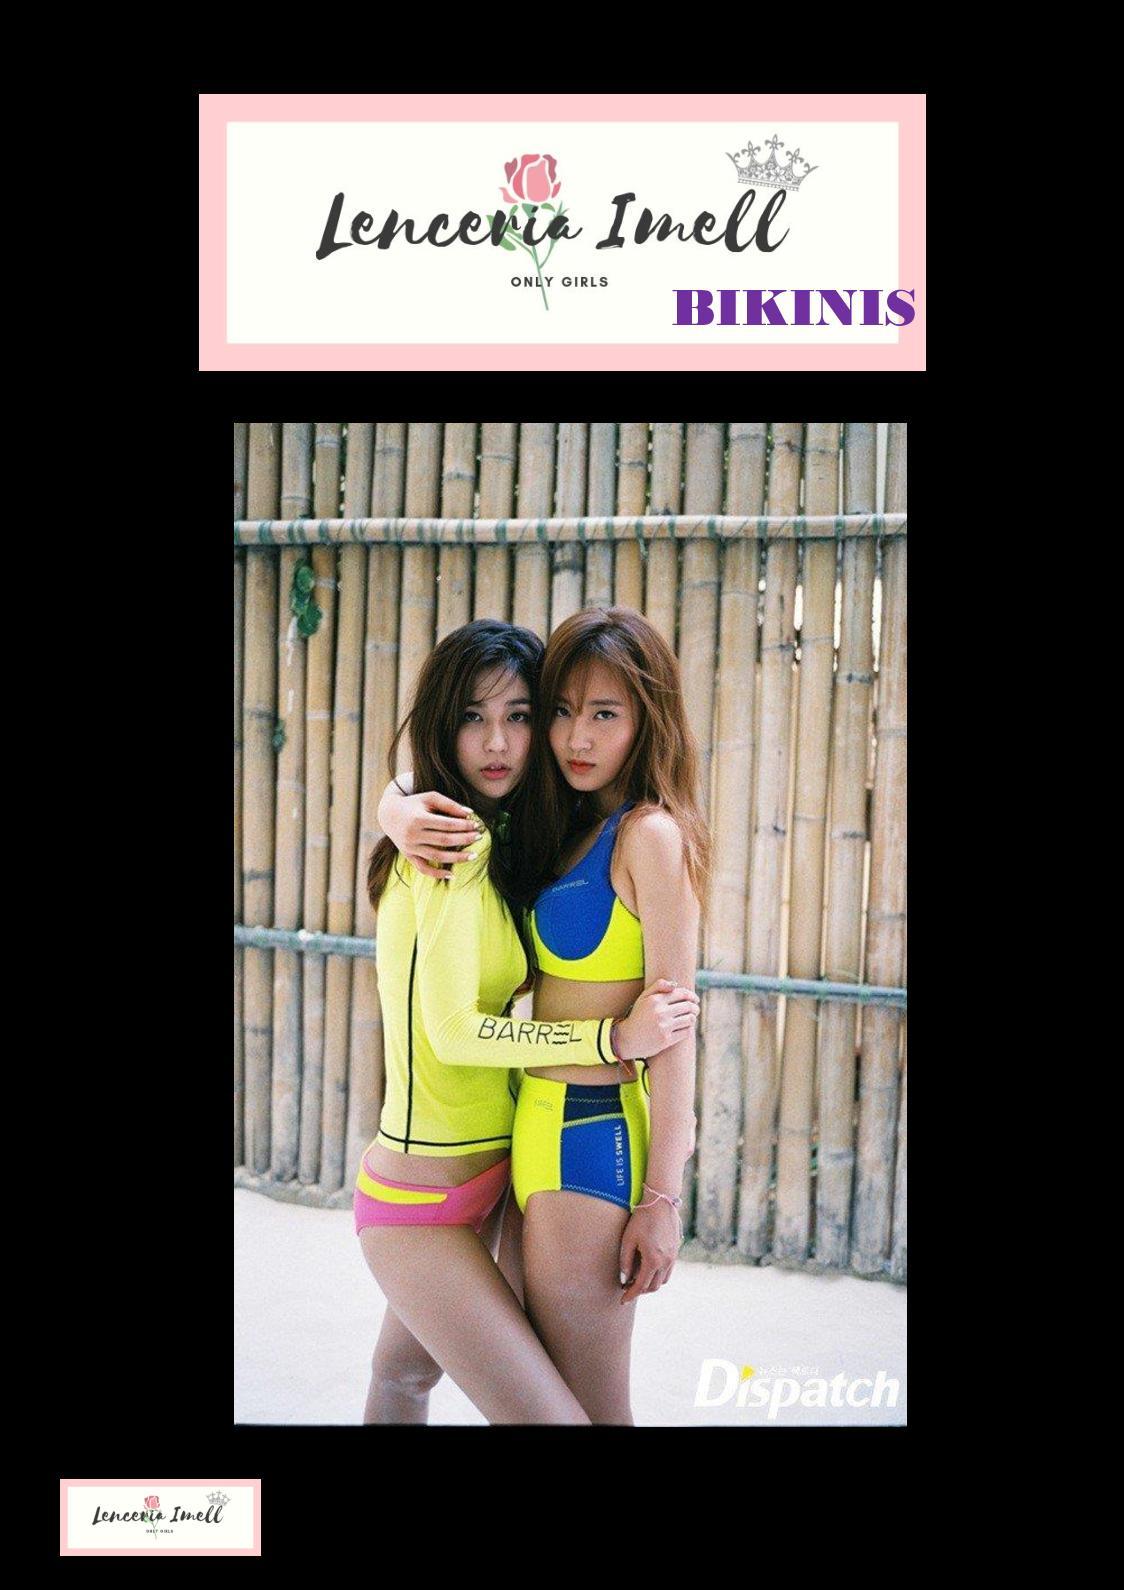 Catalogo De Bikinis